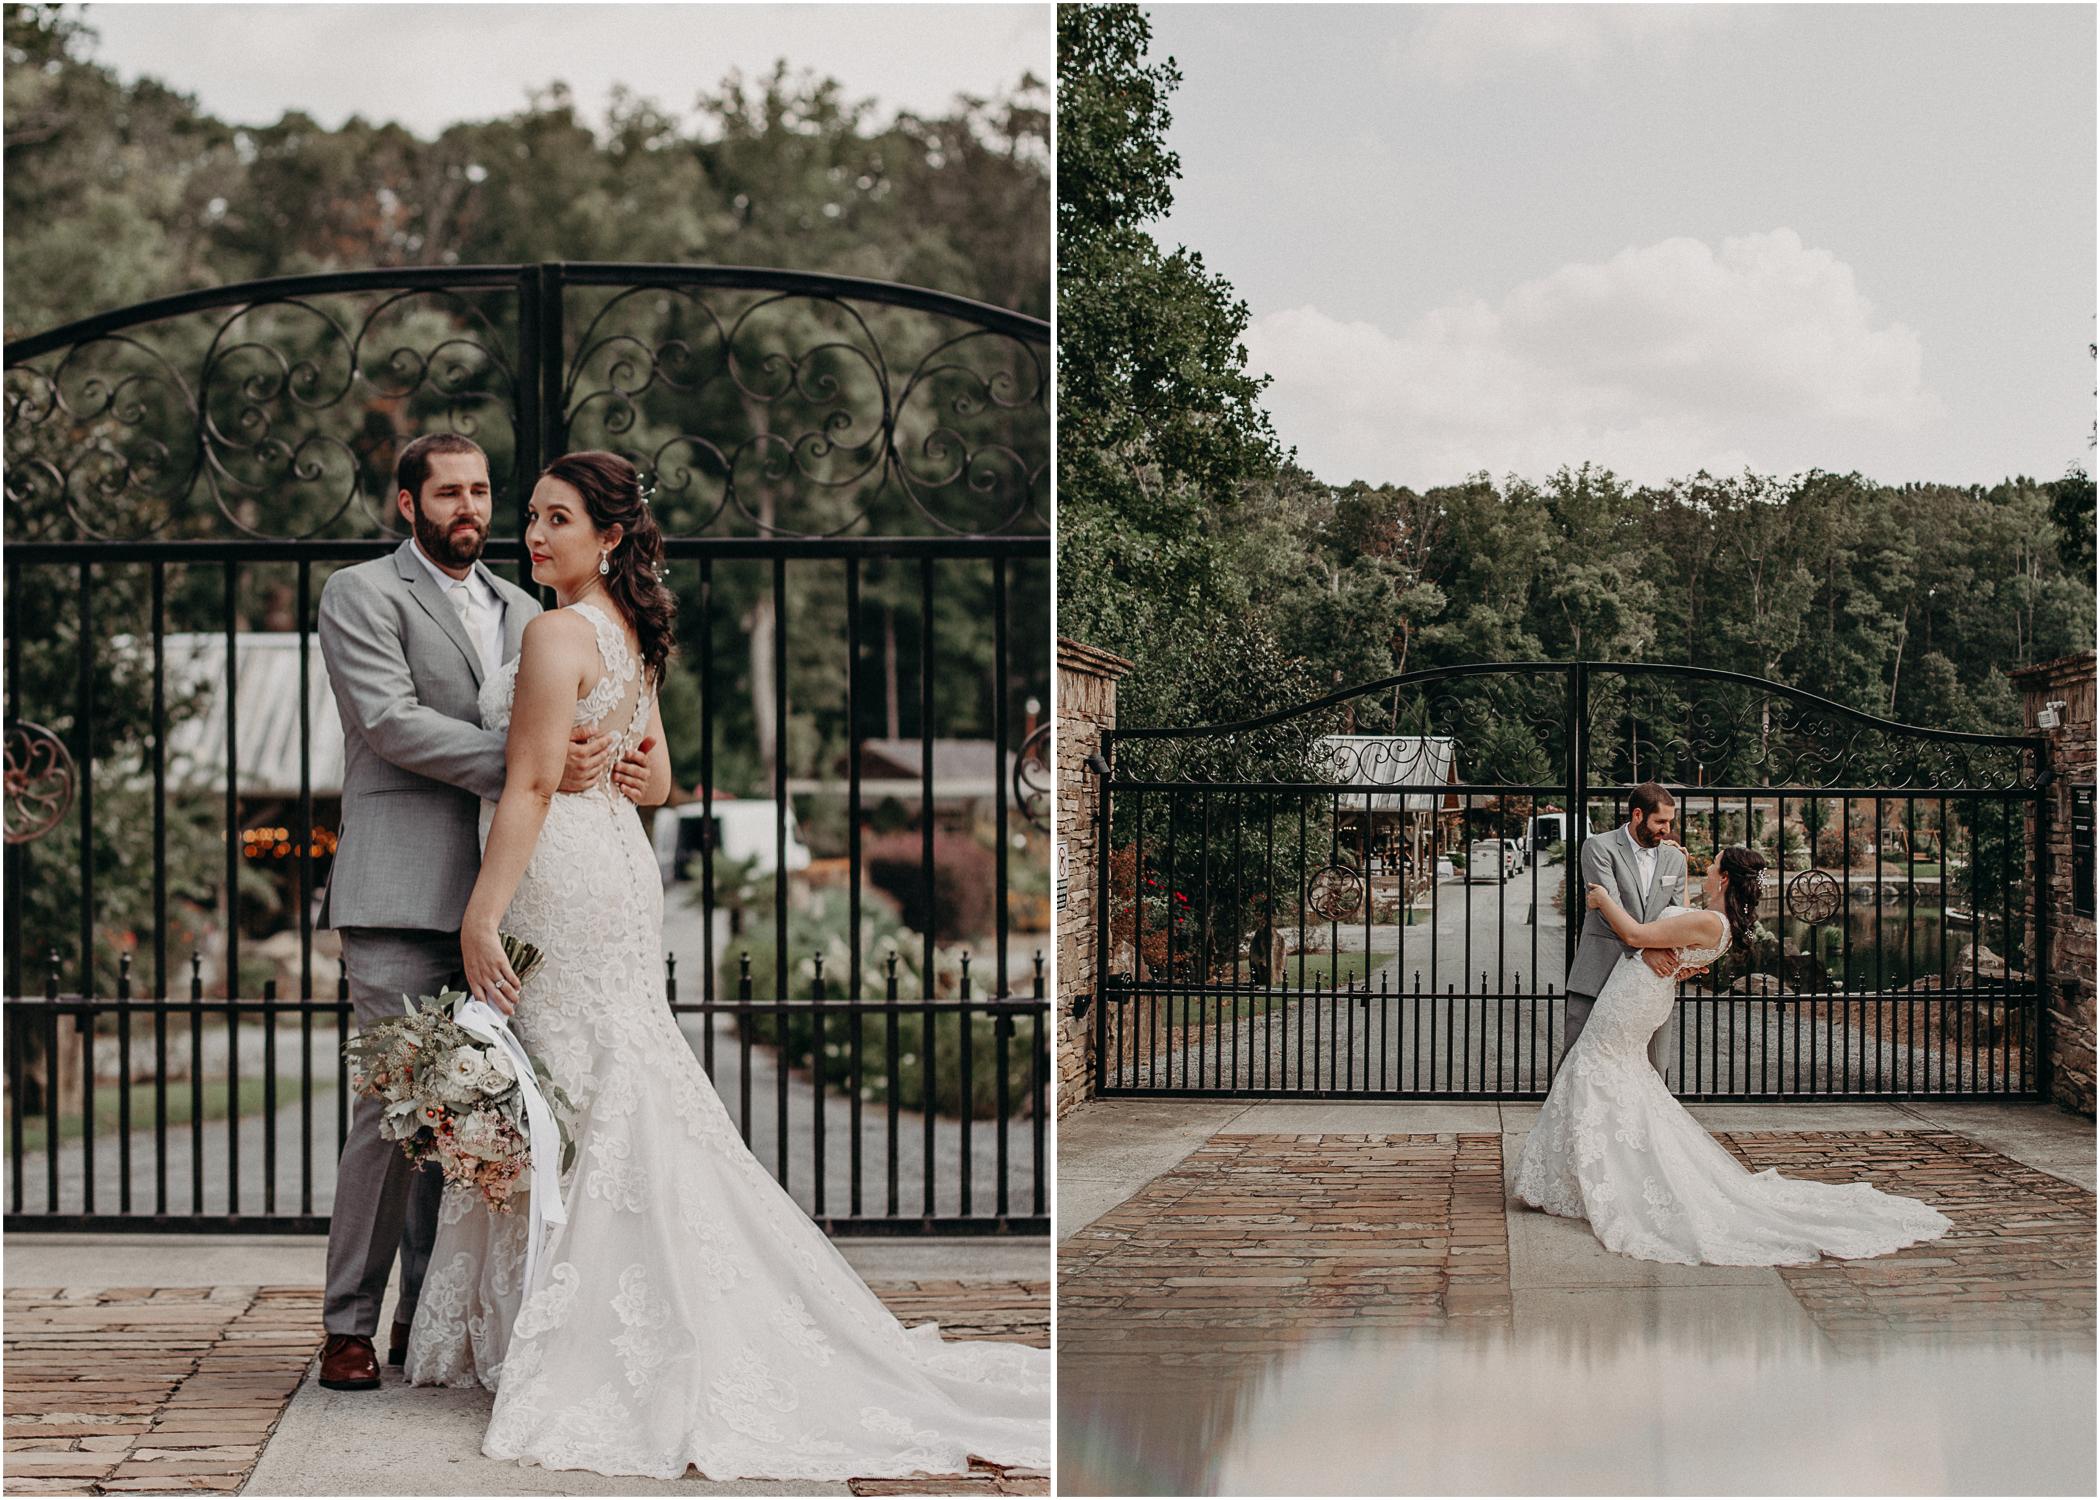 33 wedding day portraits bride and groom atlanta - georgia - ga wedding photographer .jpg